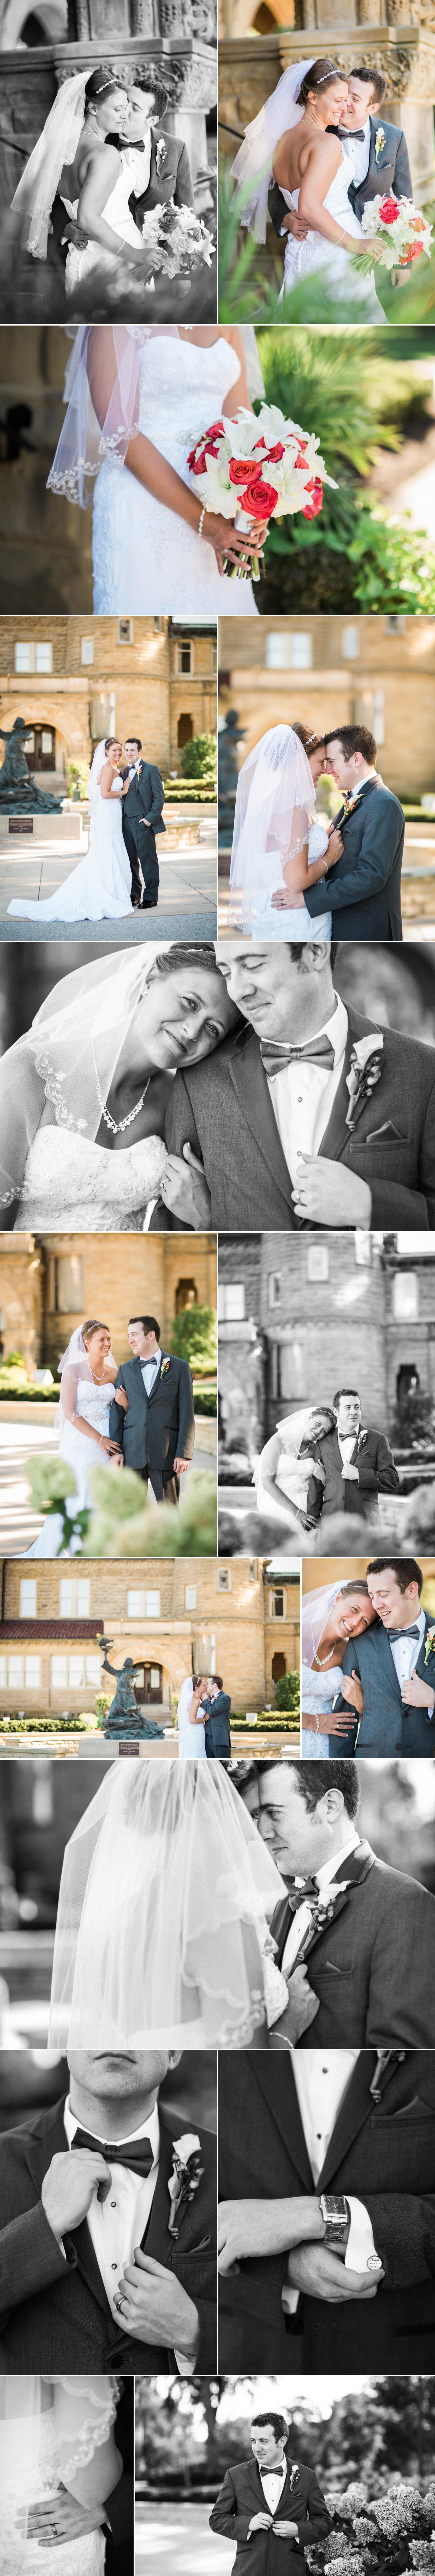 fort wayne-indiana-wedding-bride-groom-ceremony-wedding day-love-ceruti's-morgan ruth photography-university of st francis-brookside mansion